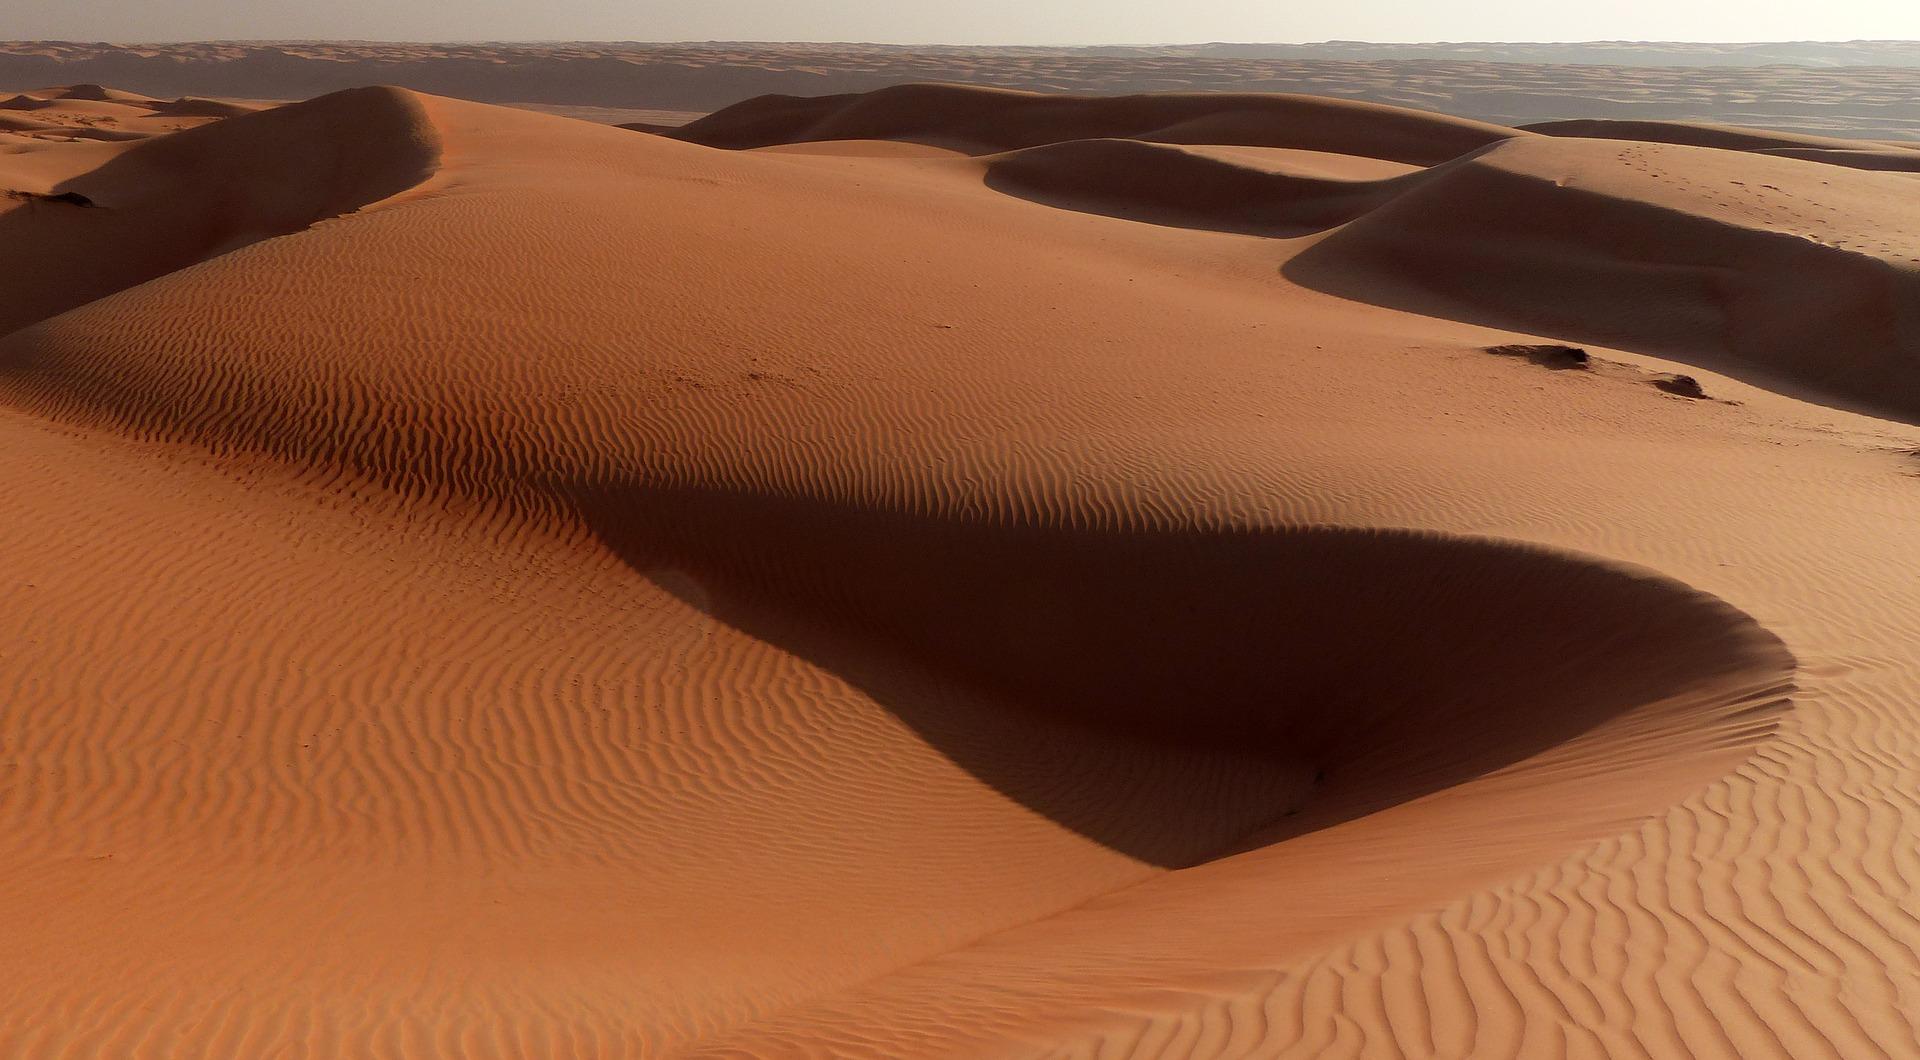 A Journey Through Arabia - Wahiba Sand Dunes, Oman